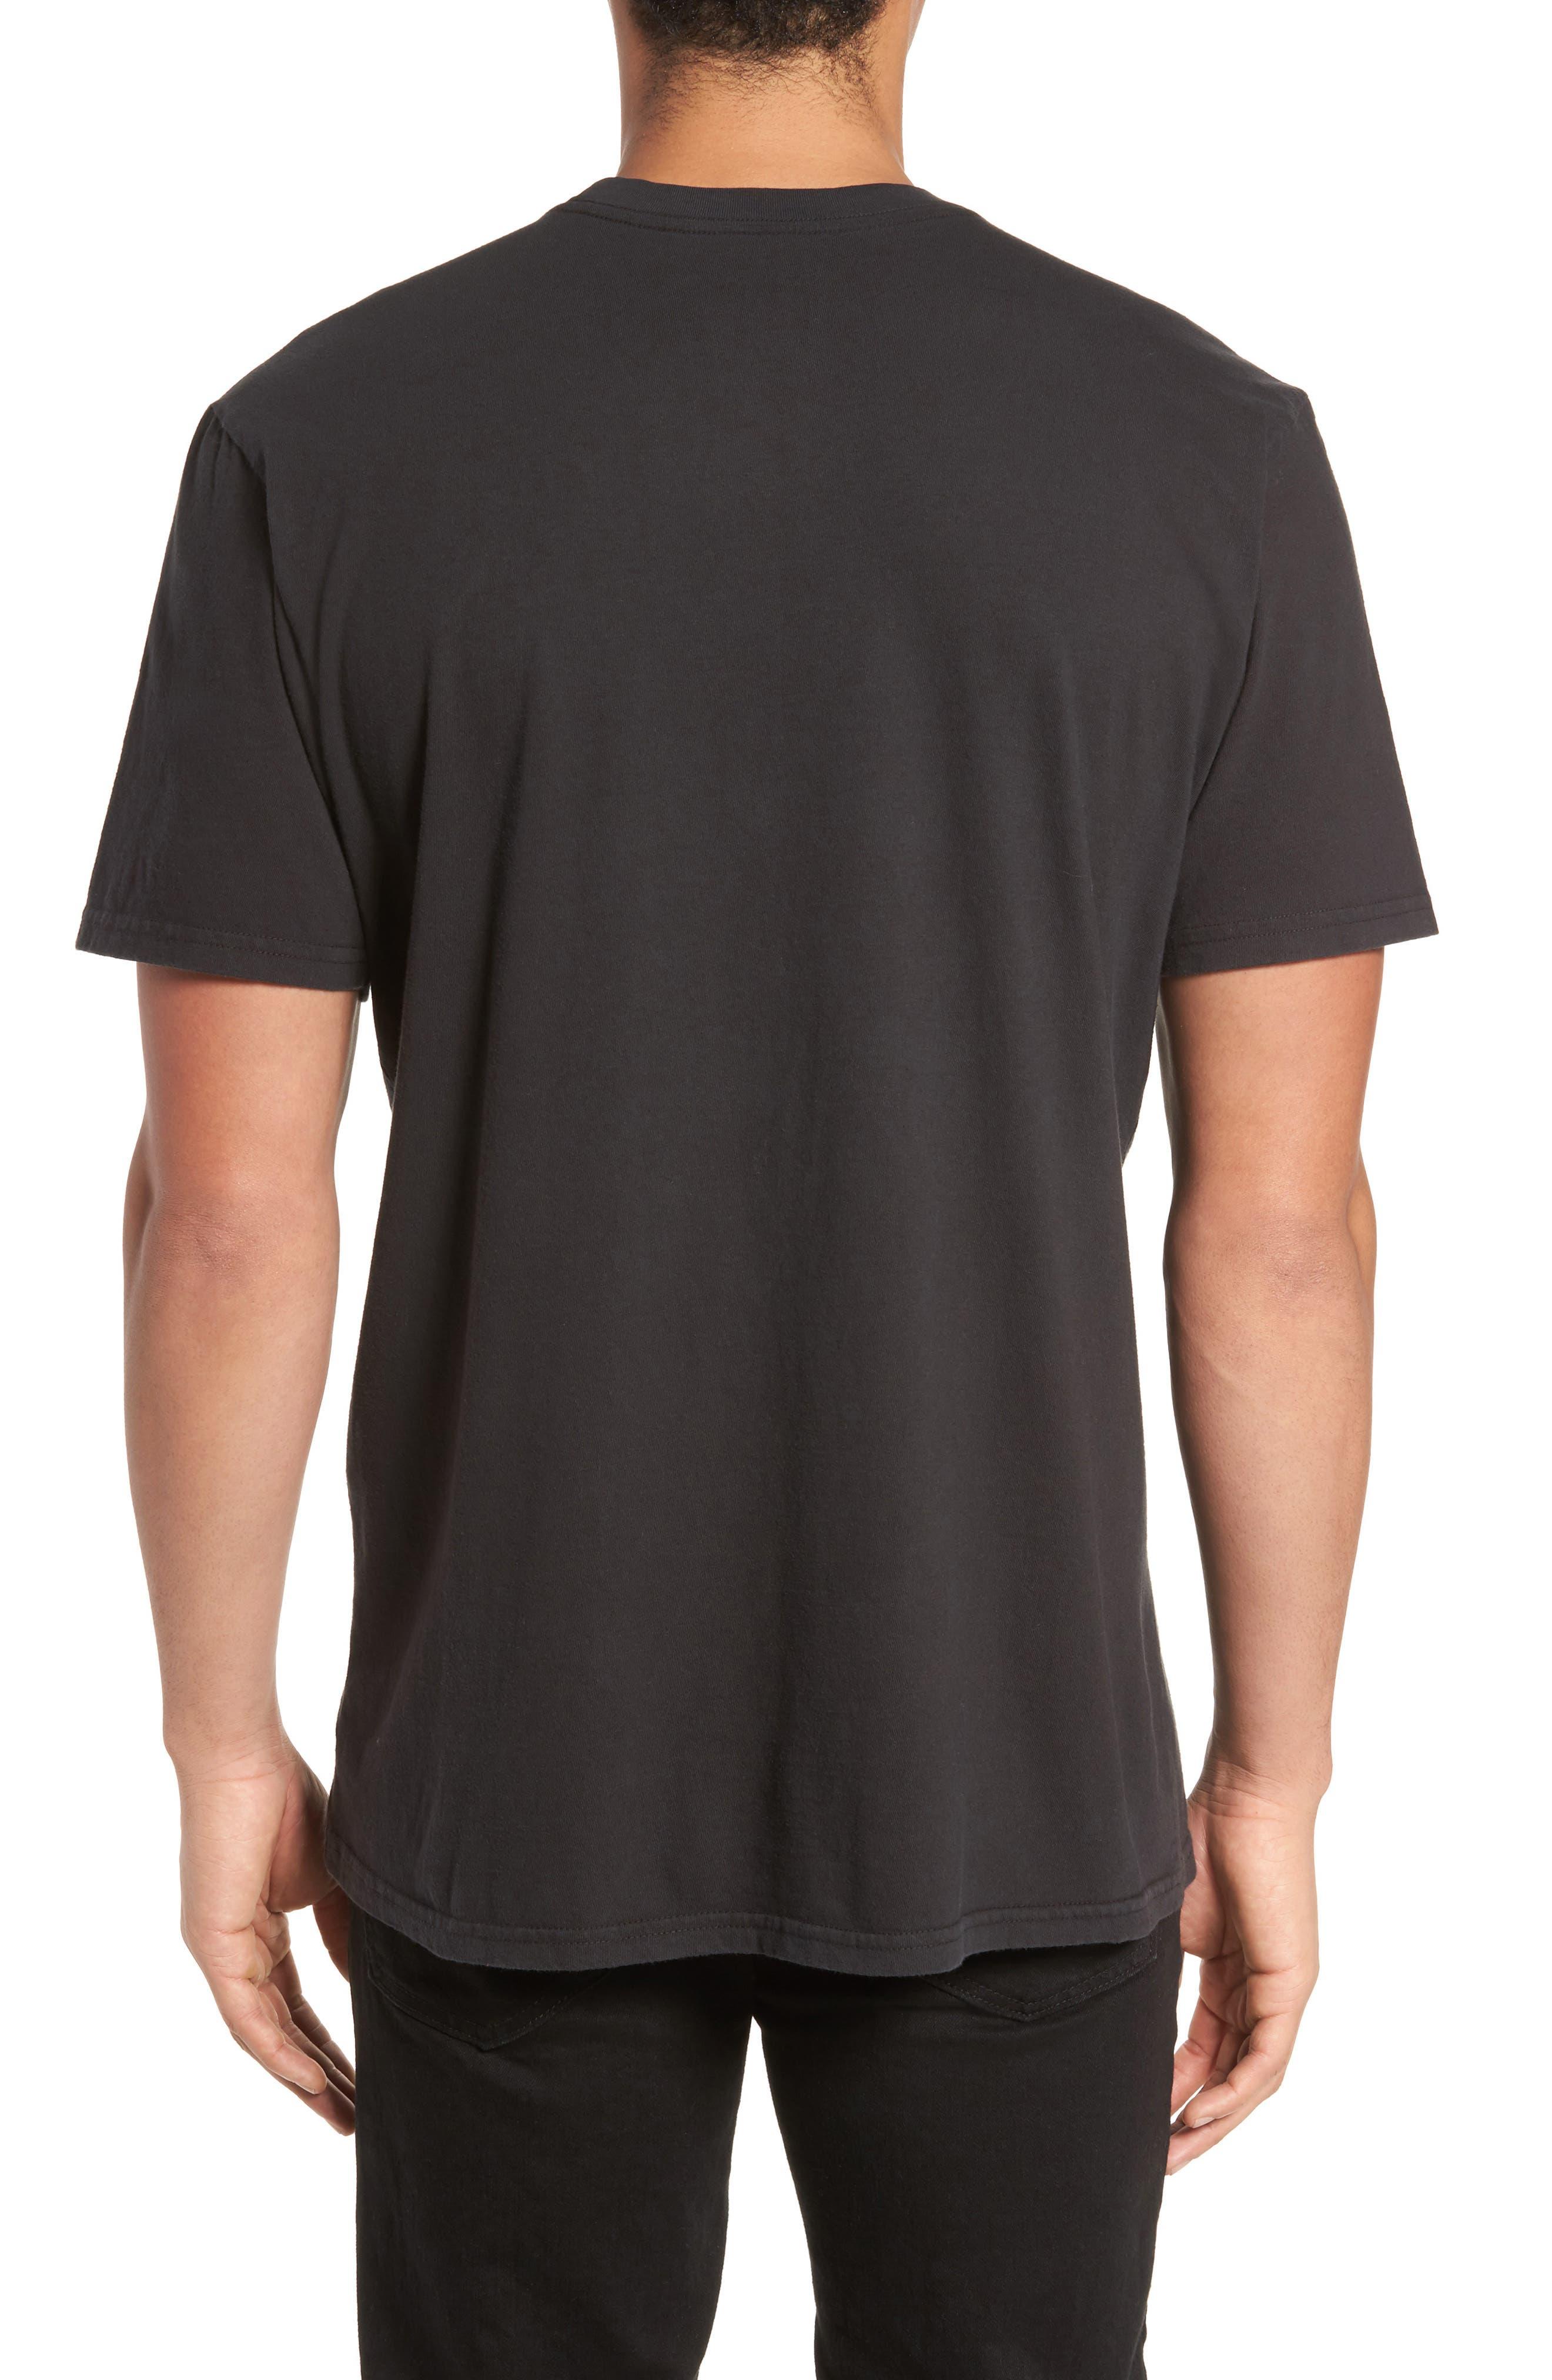 Iggy Pop x Billabong Iguana T-Shirt,                             Alternate thumbnail 2, color,                             001